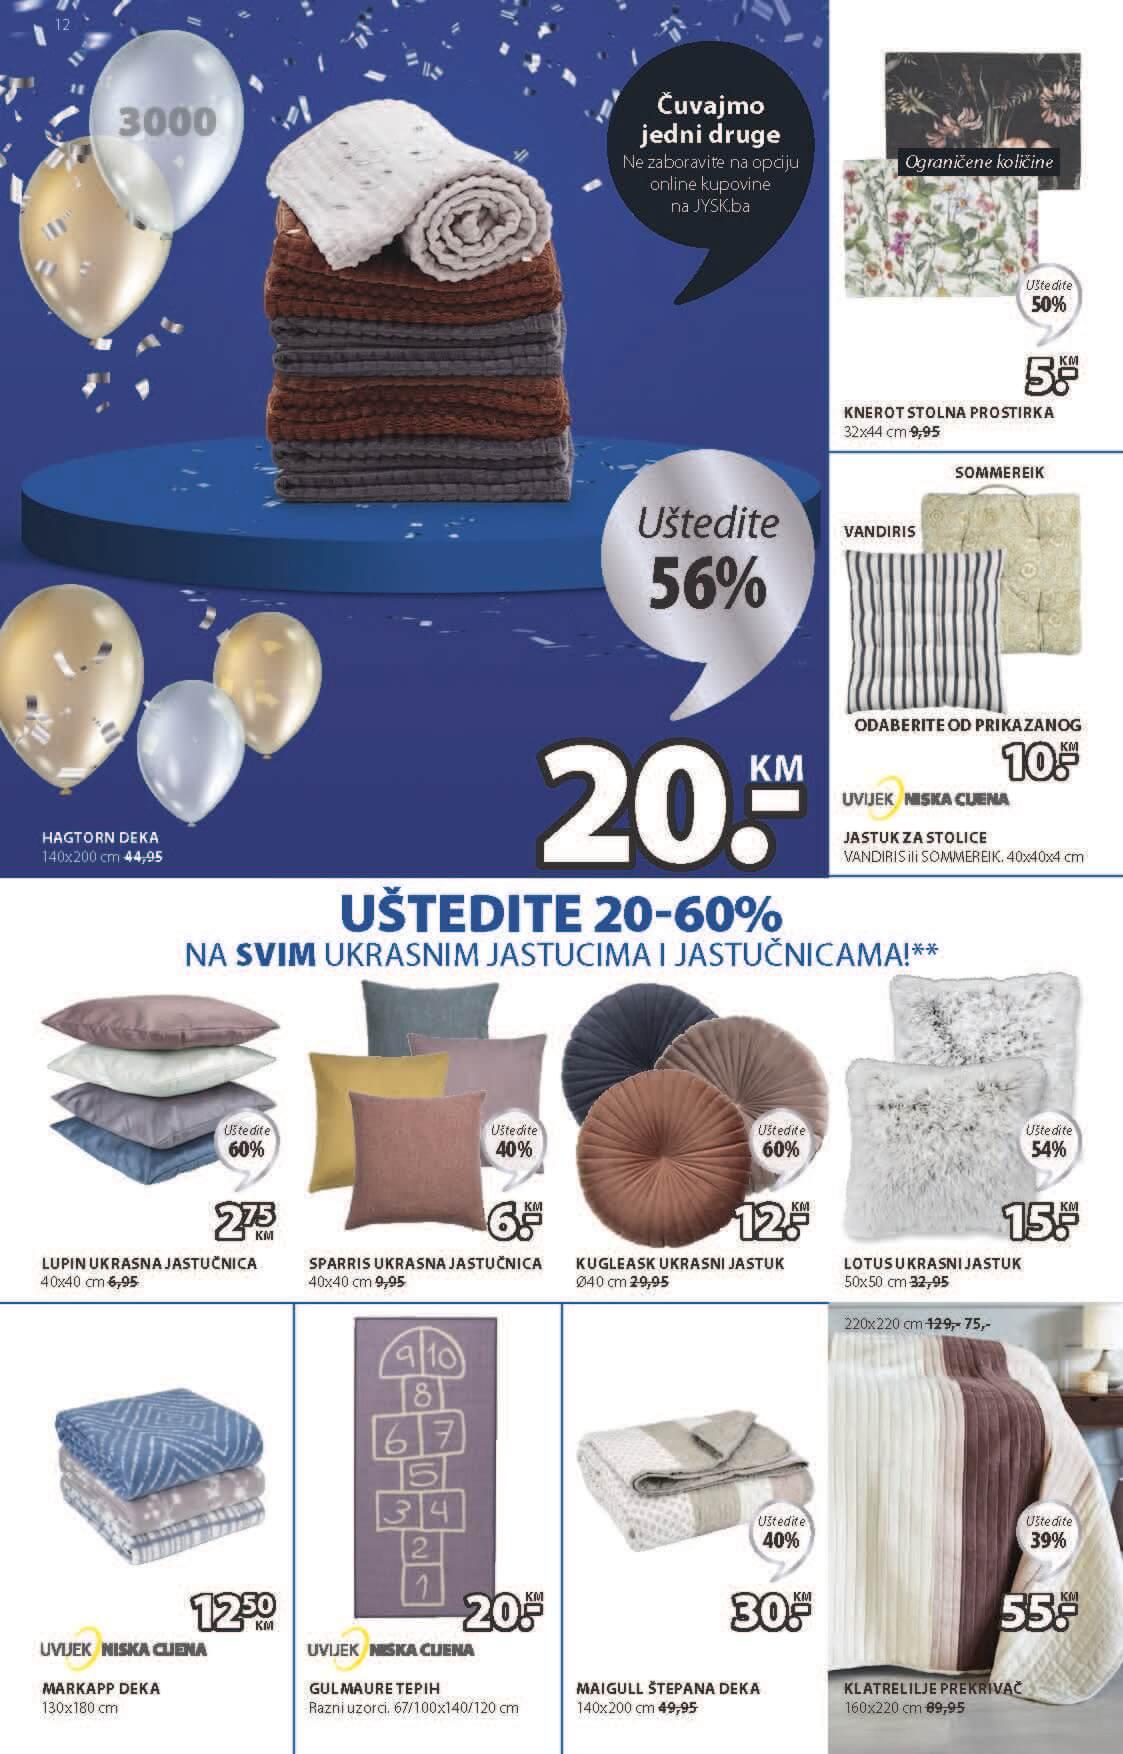 JYSK Katalog Akcijska ponuda MAJ 13.05.2021. 26.05.2021 ekatalozi.com Page 13